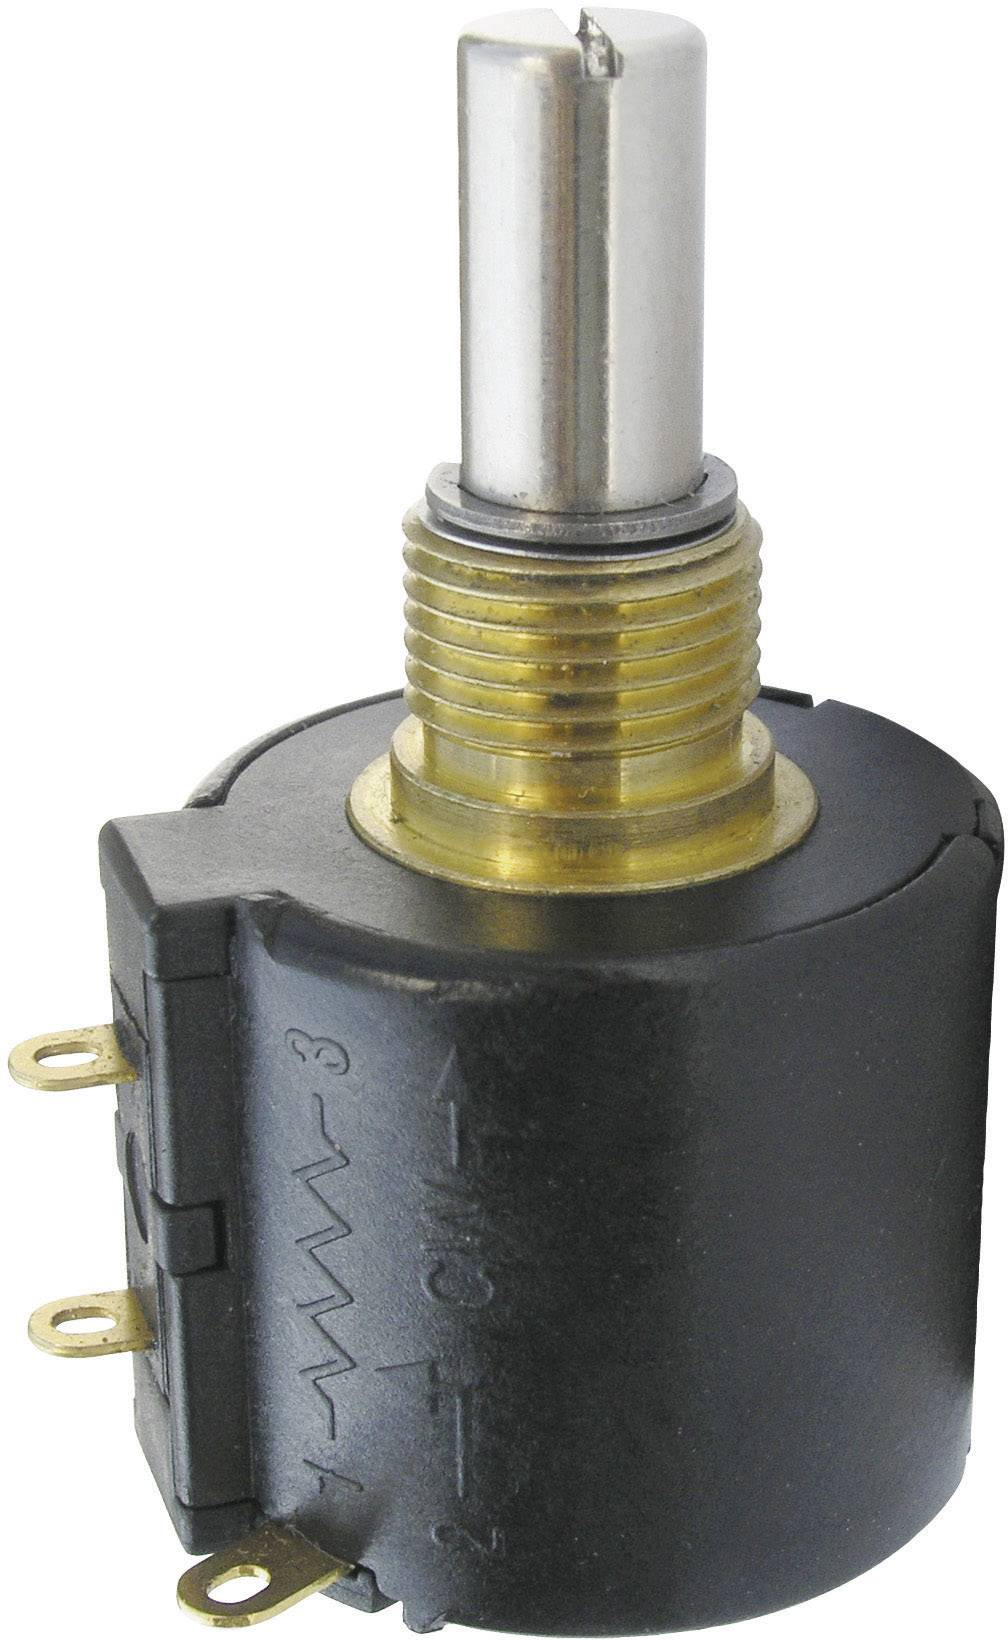 Presný potenciometer Wirewound, 10-cestný mono Bourns 3549S-1AA-202A 3549S-1AA-202A, 2 W, 2 kOhm, 1 ks